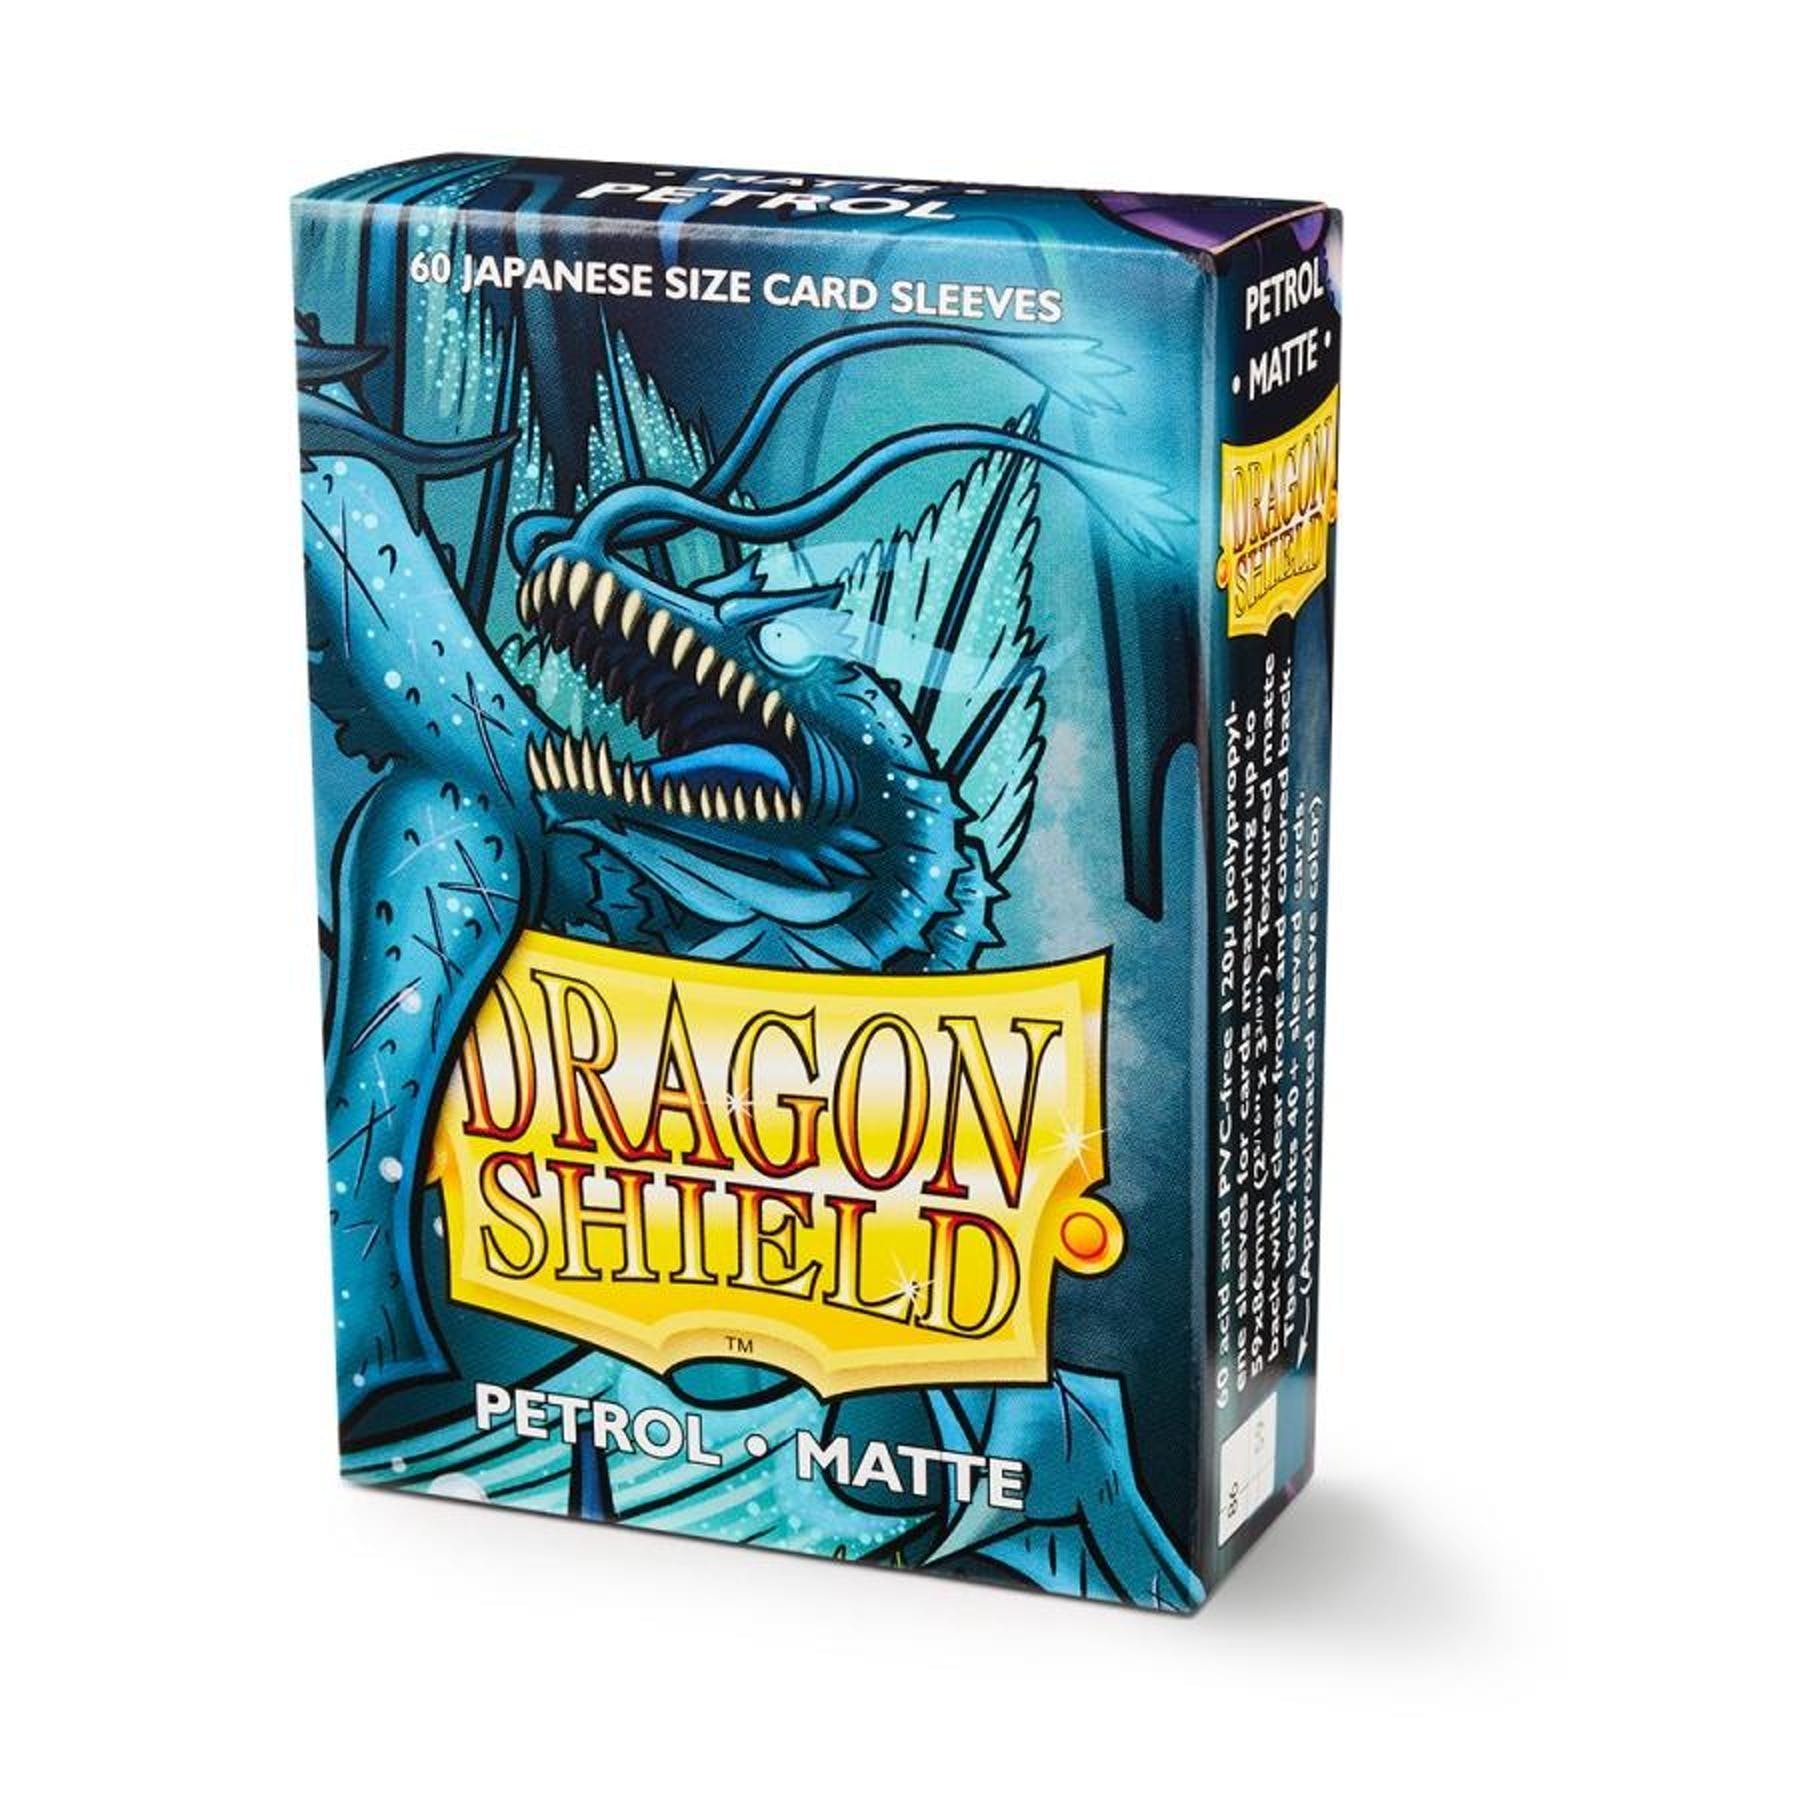 Dragon Shield Yu-Gi-Oh! Size Card Sleeves